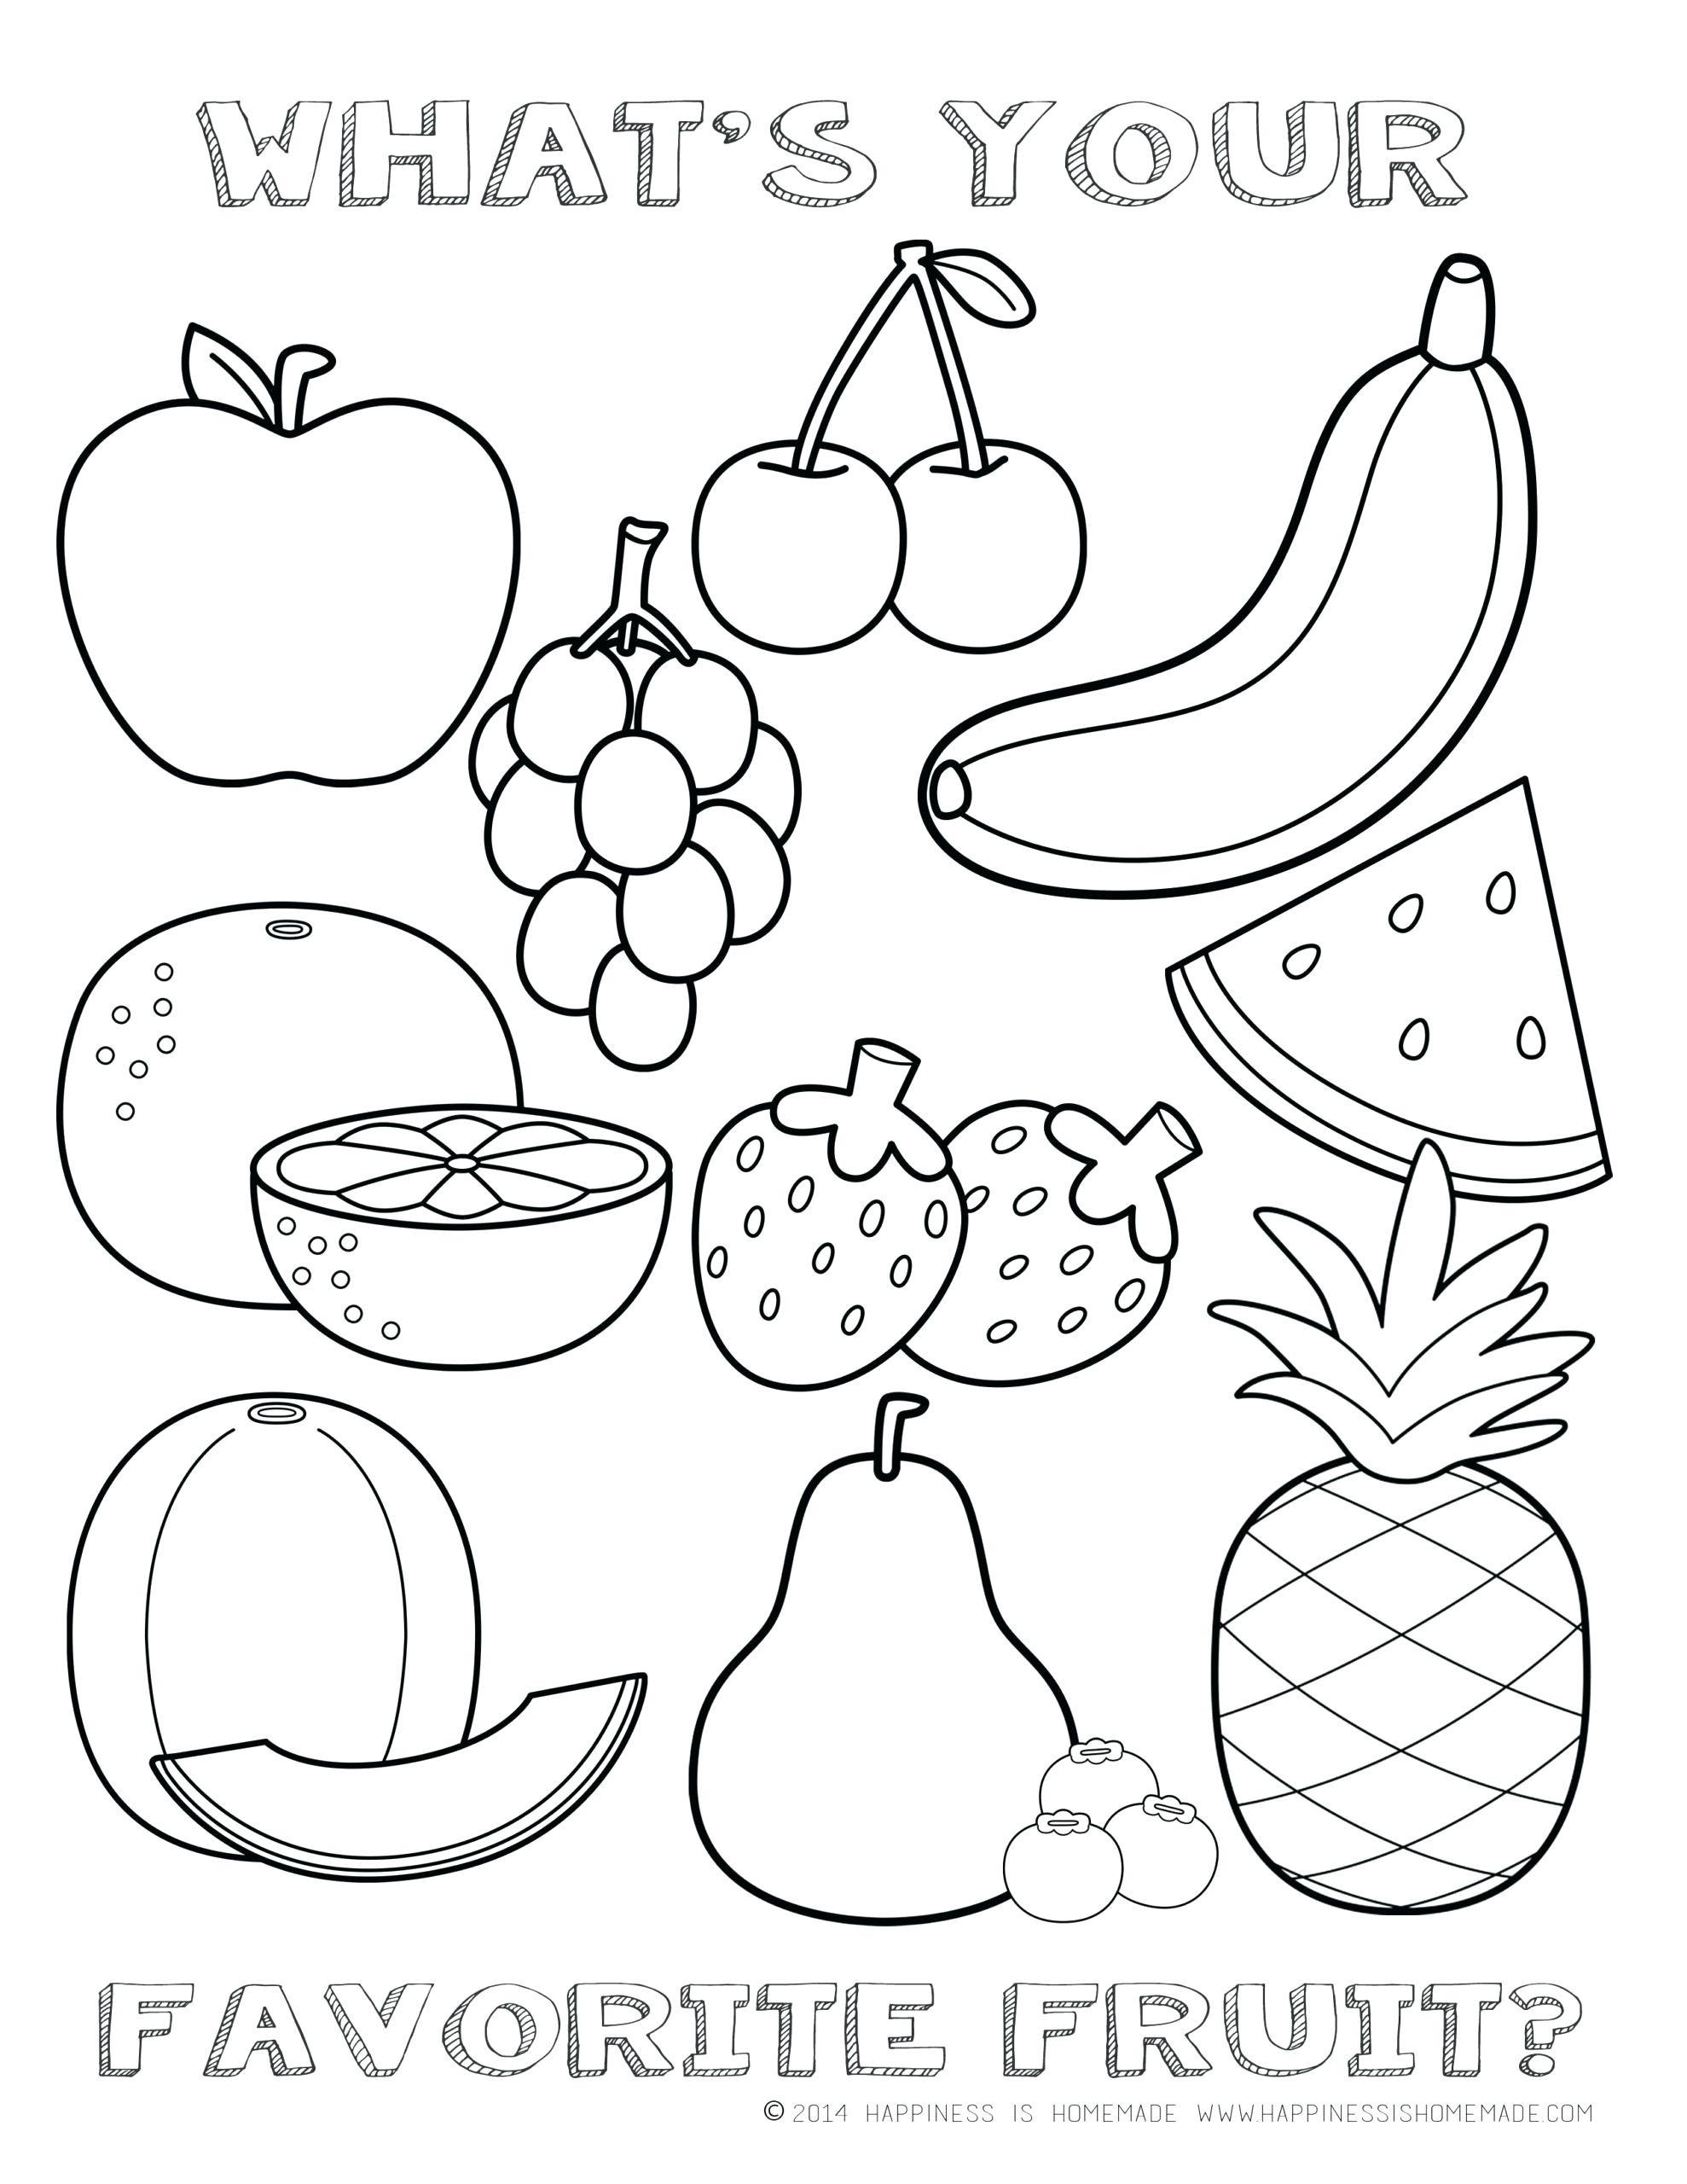 Fruits Of the Spirit Worksheet Galatians Kjv Nlt the Fruitf Spirit Bible Study for Kids